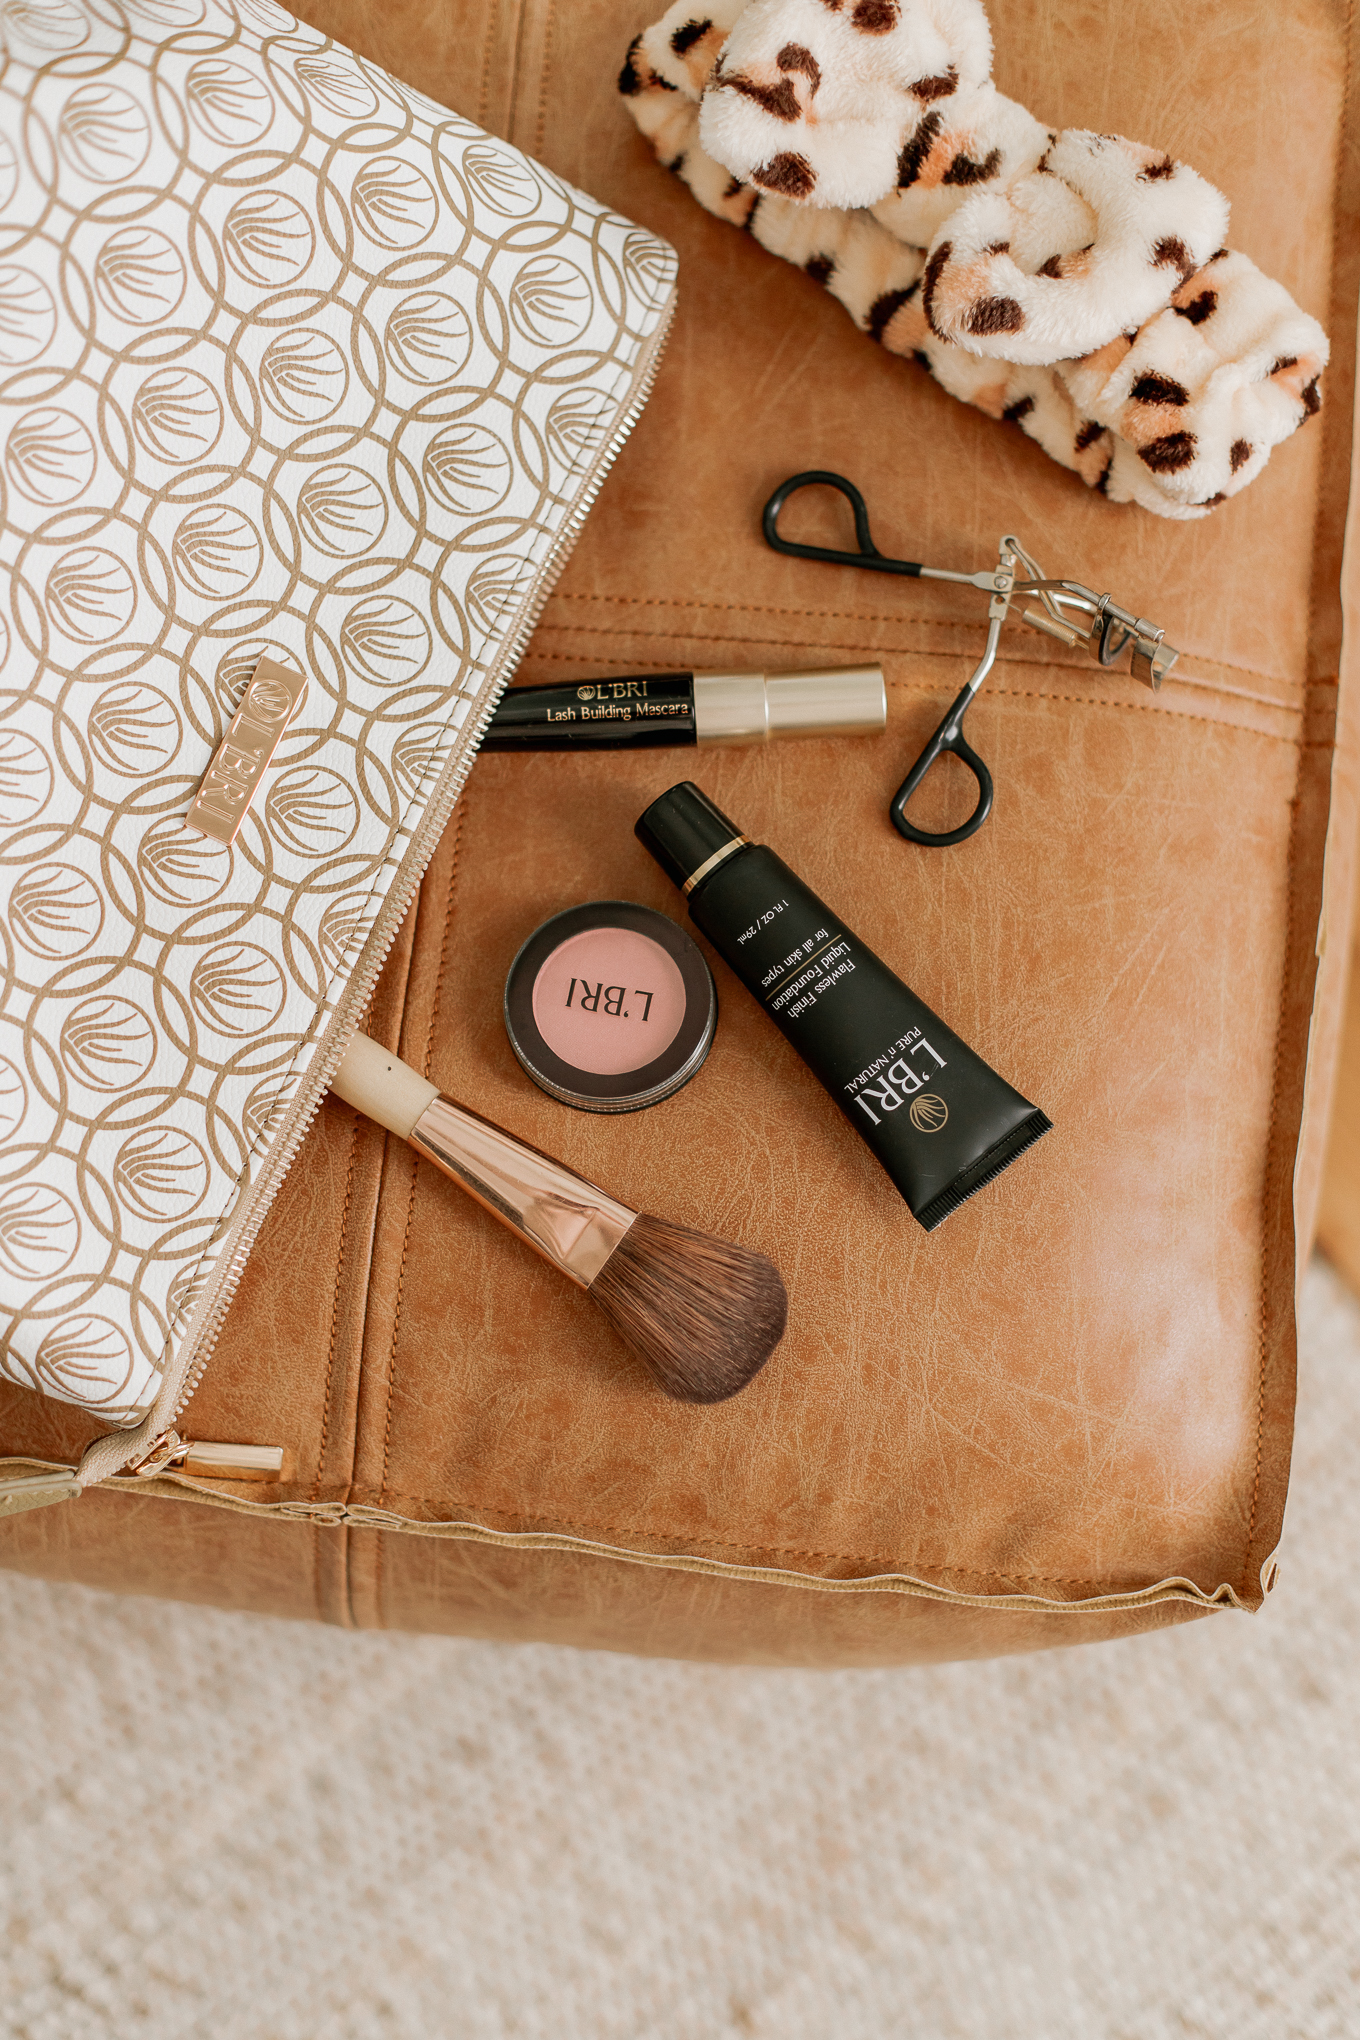 Budget-Friendly Makeup Favorites | L'BRI Pure N' Natural | Louella Reese #cleanbeauty #makeup #budgetfriendlybeauty